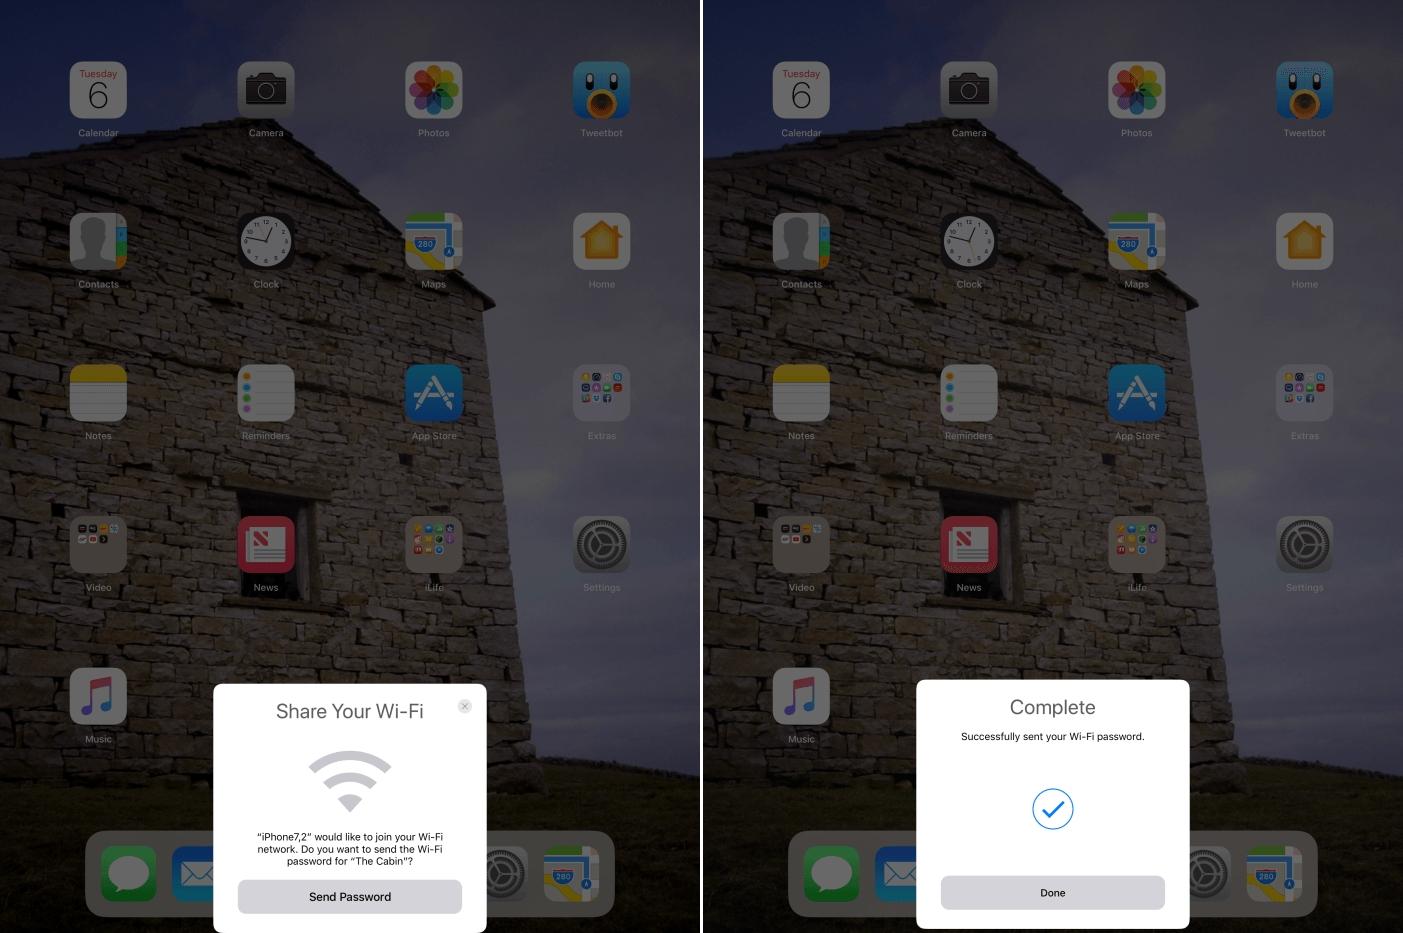 iOS 11 partajare parola WI-Fi